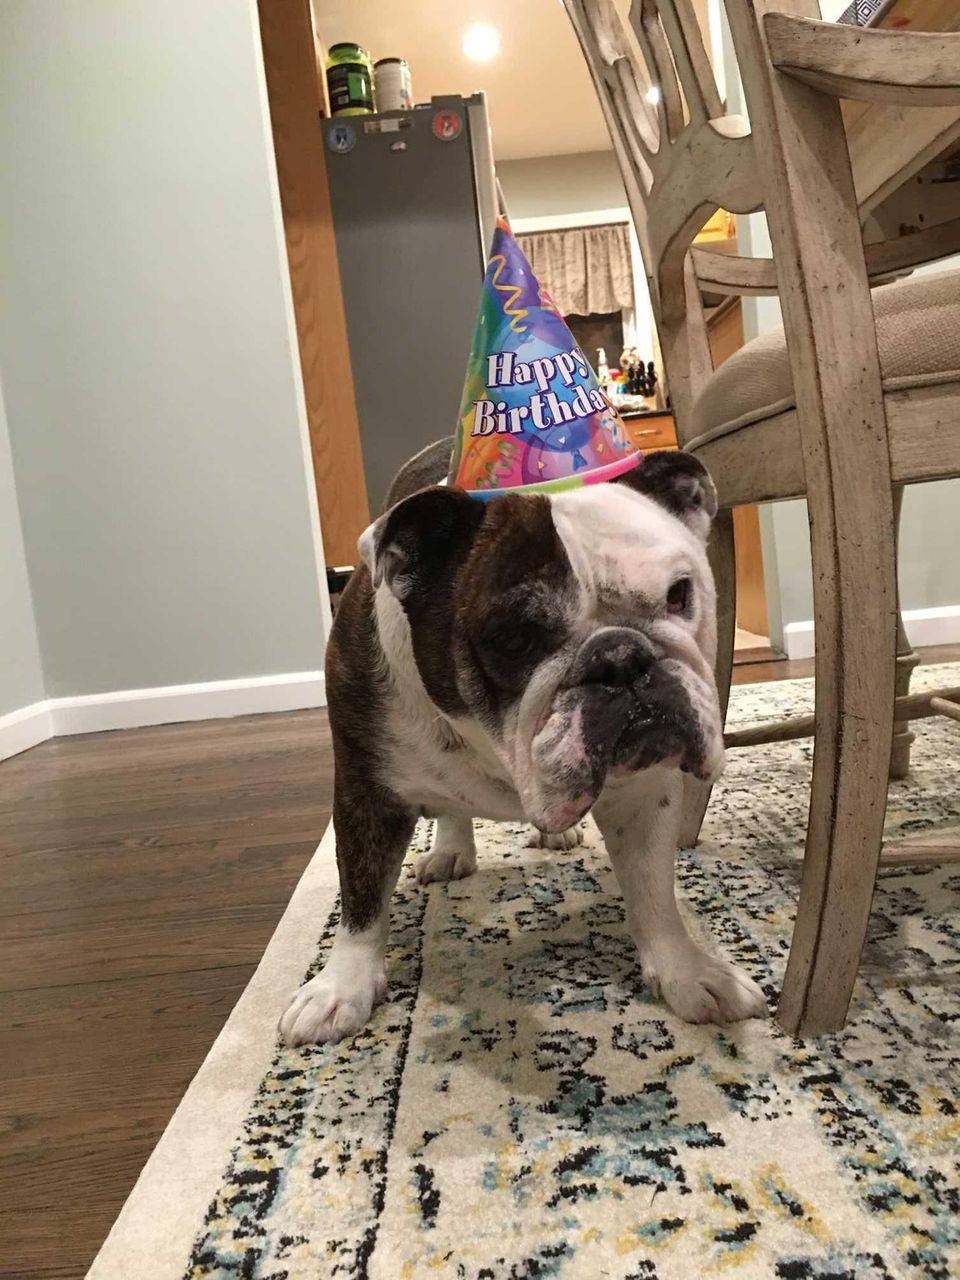 Our bully dog Lilos birthday